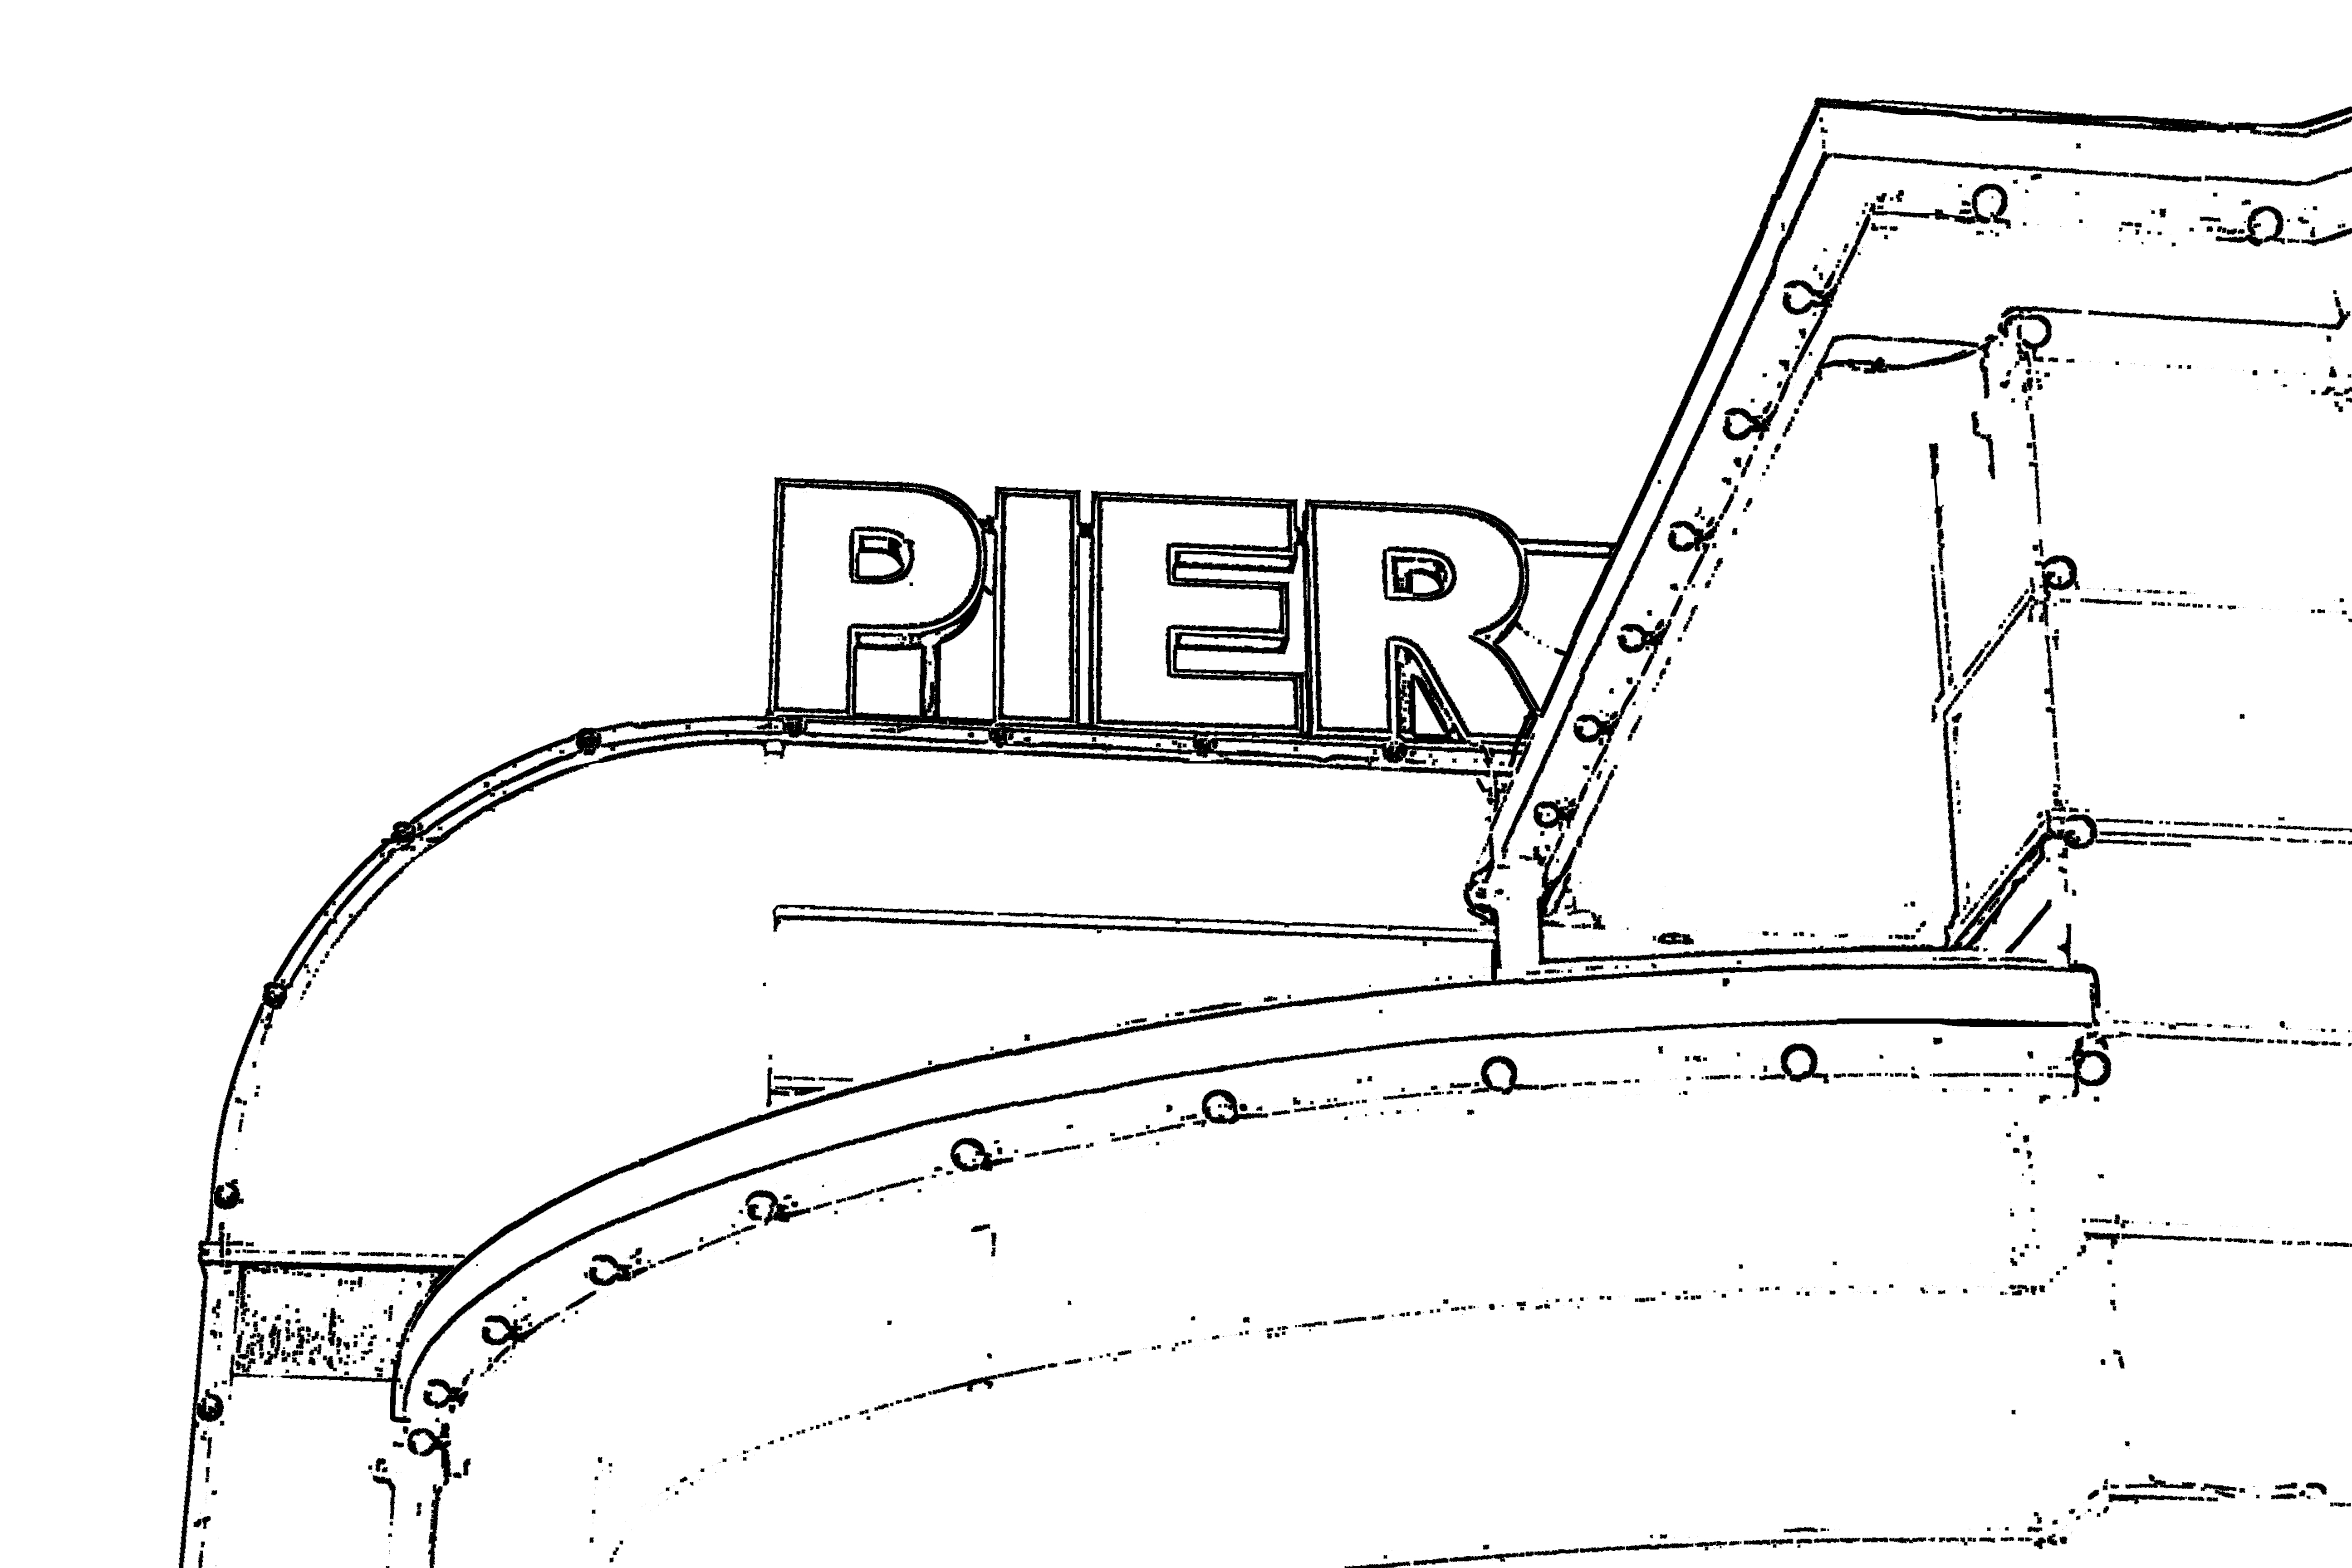 pier for T&T